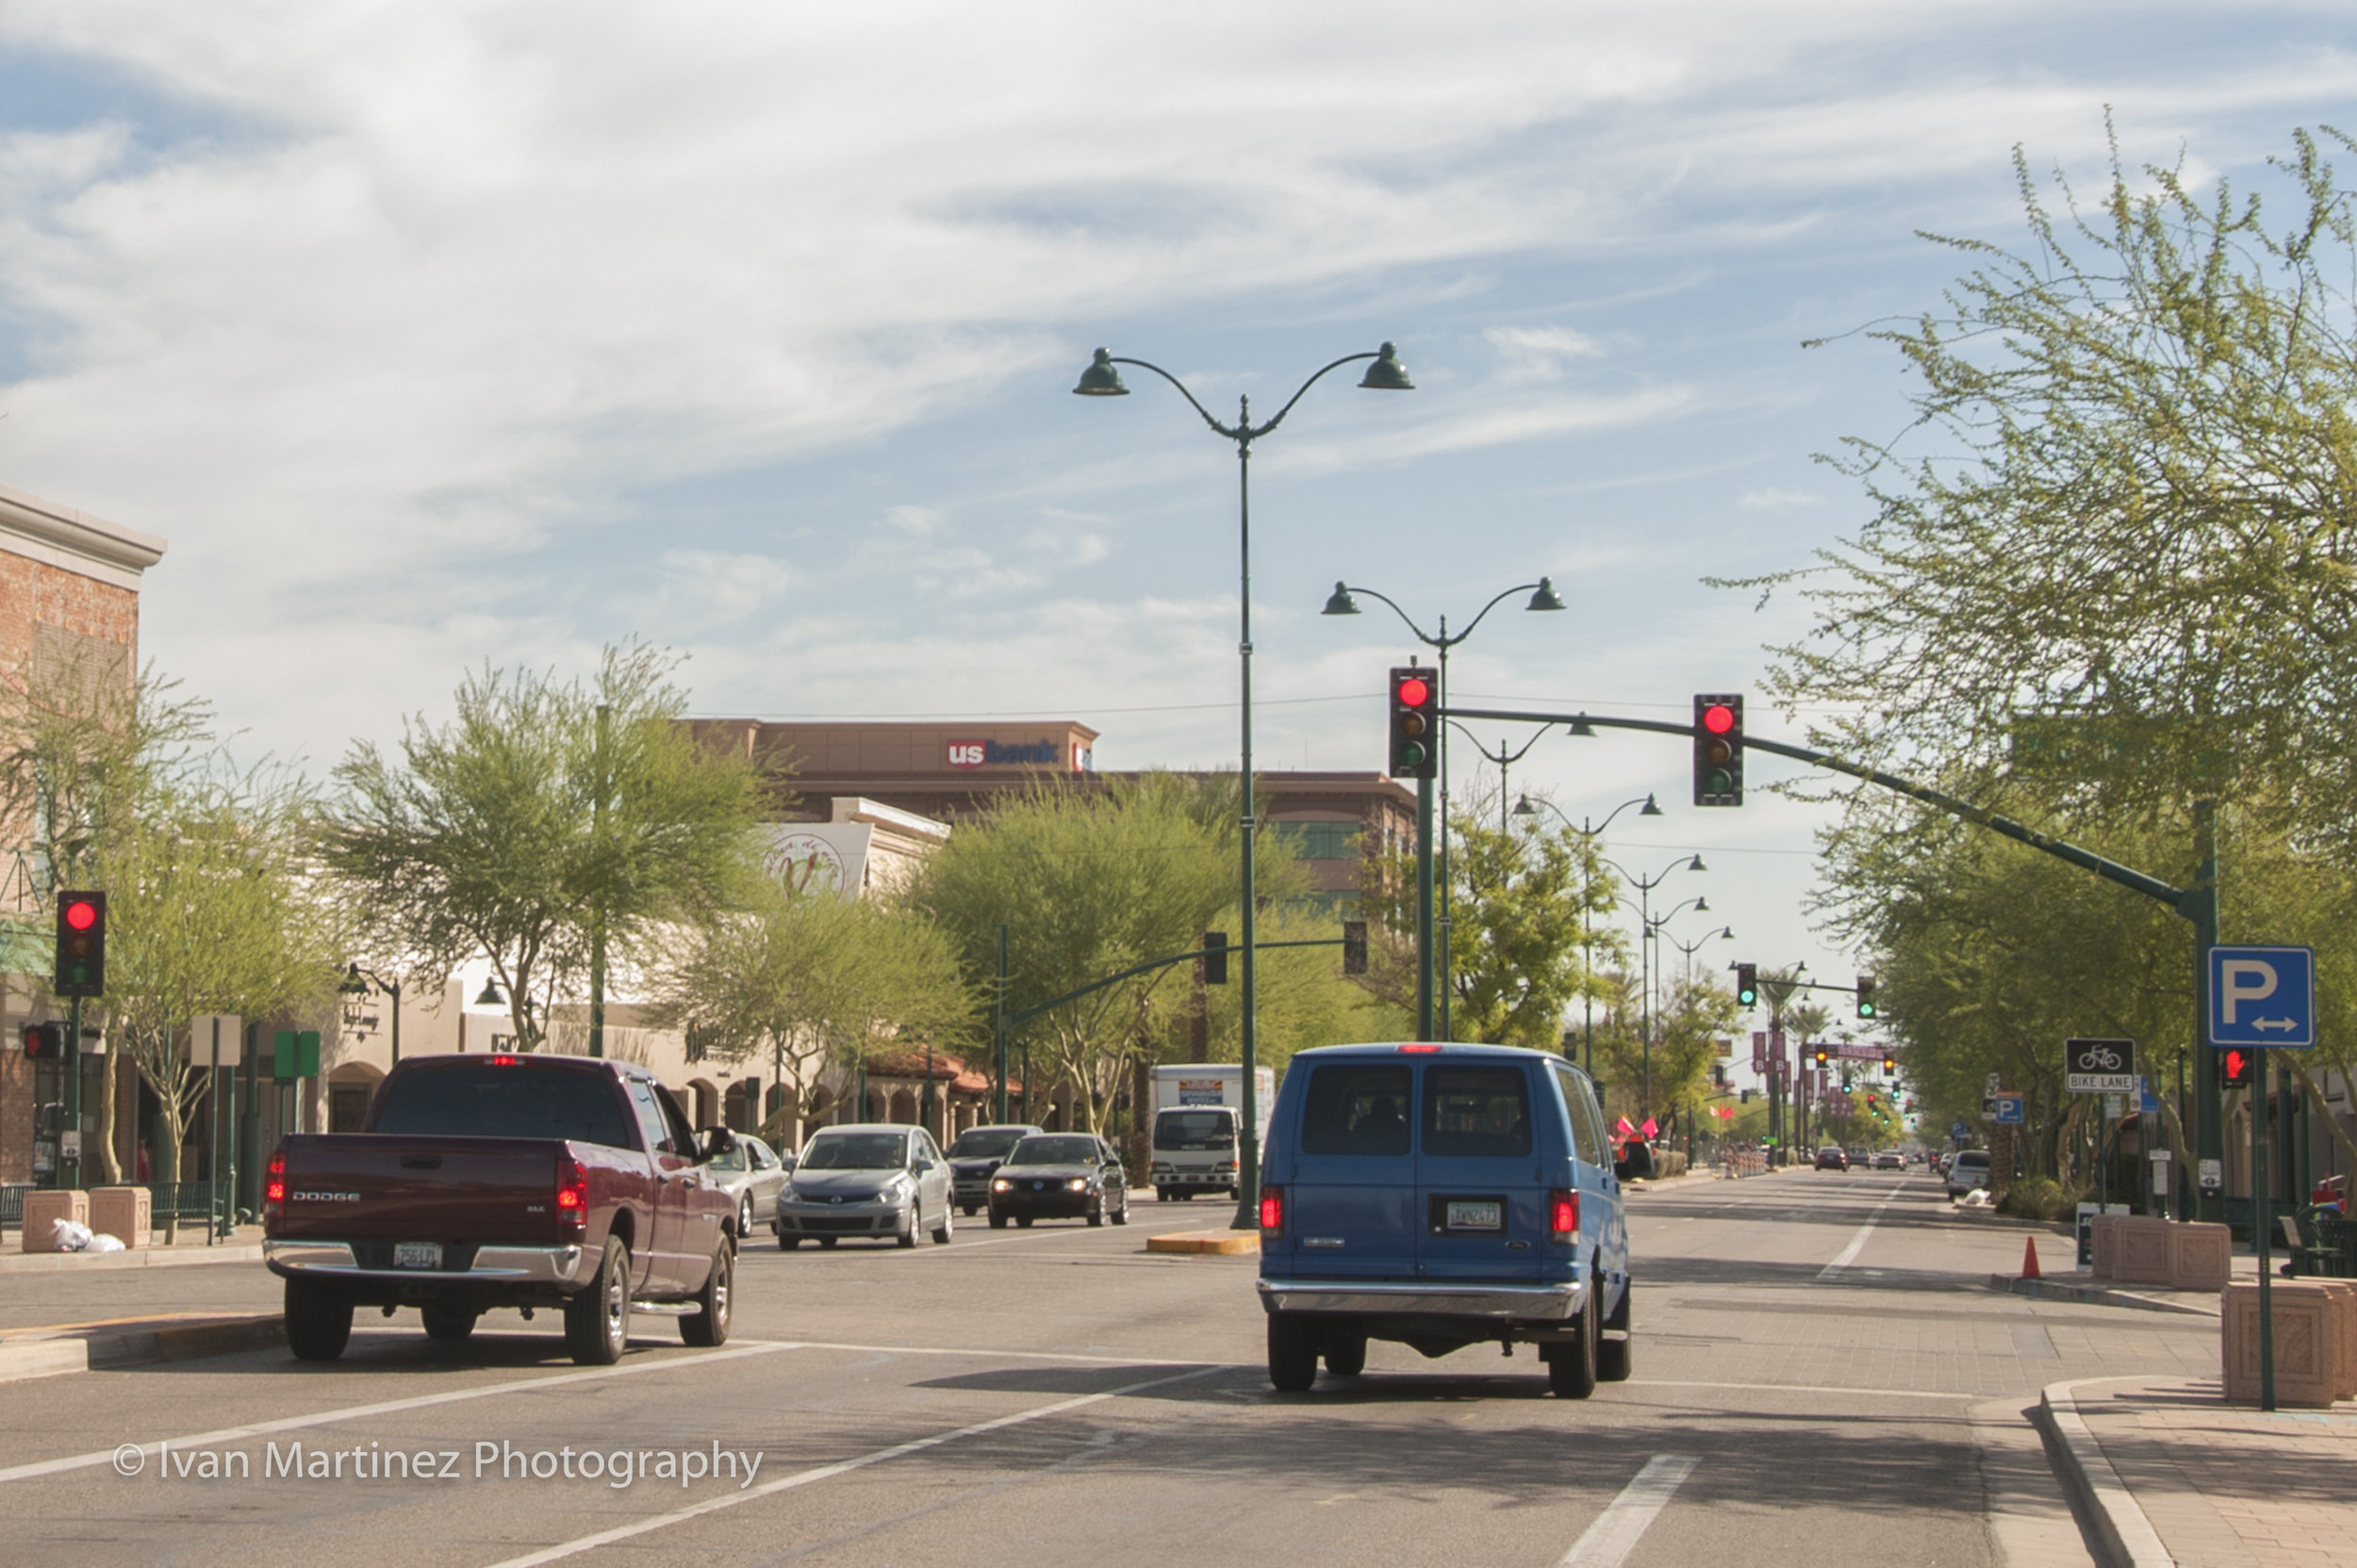 Downtown Mesa October 2012. Near corner of Main and Robson